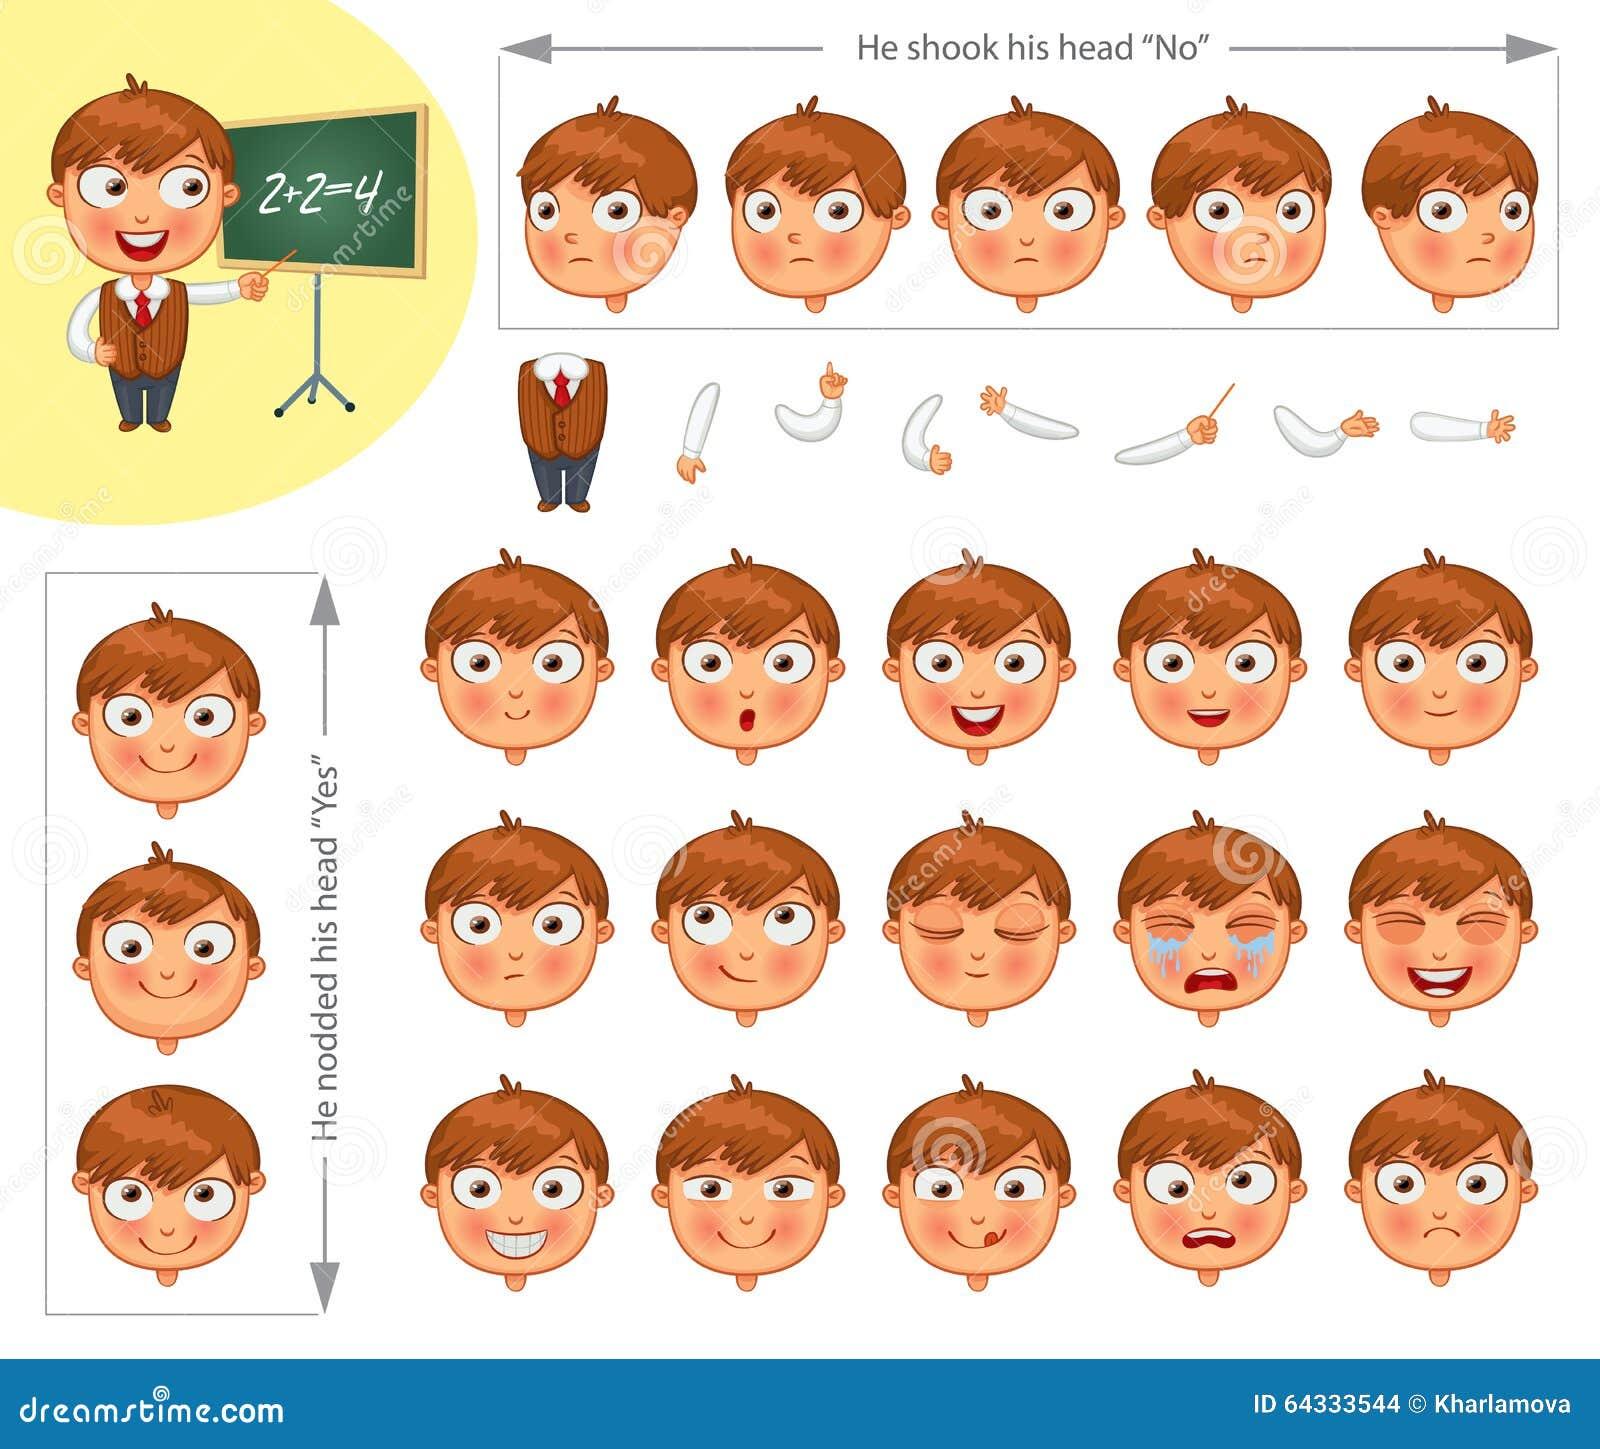 Cartoon Character Design Templates : Schoolboy cartoons illustrations vector stock images